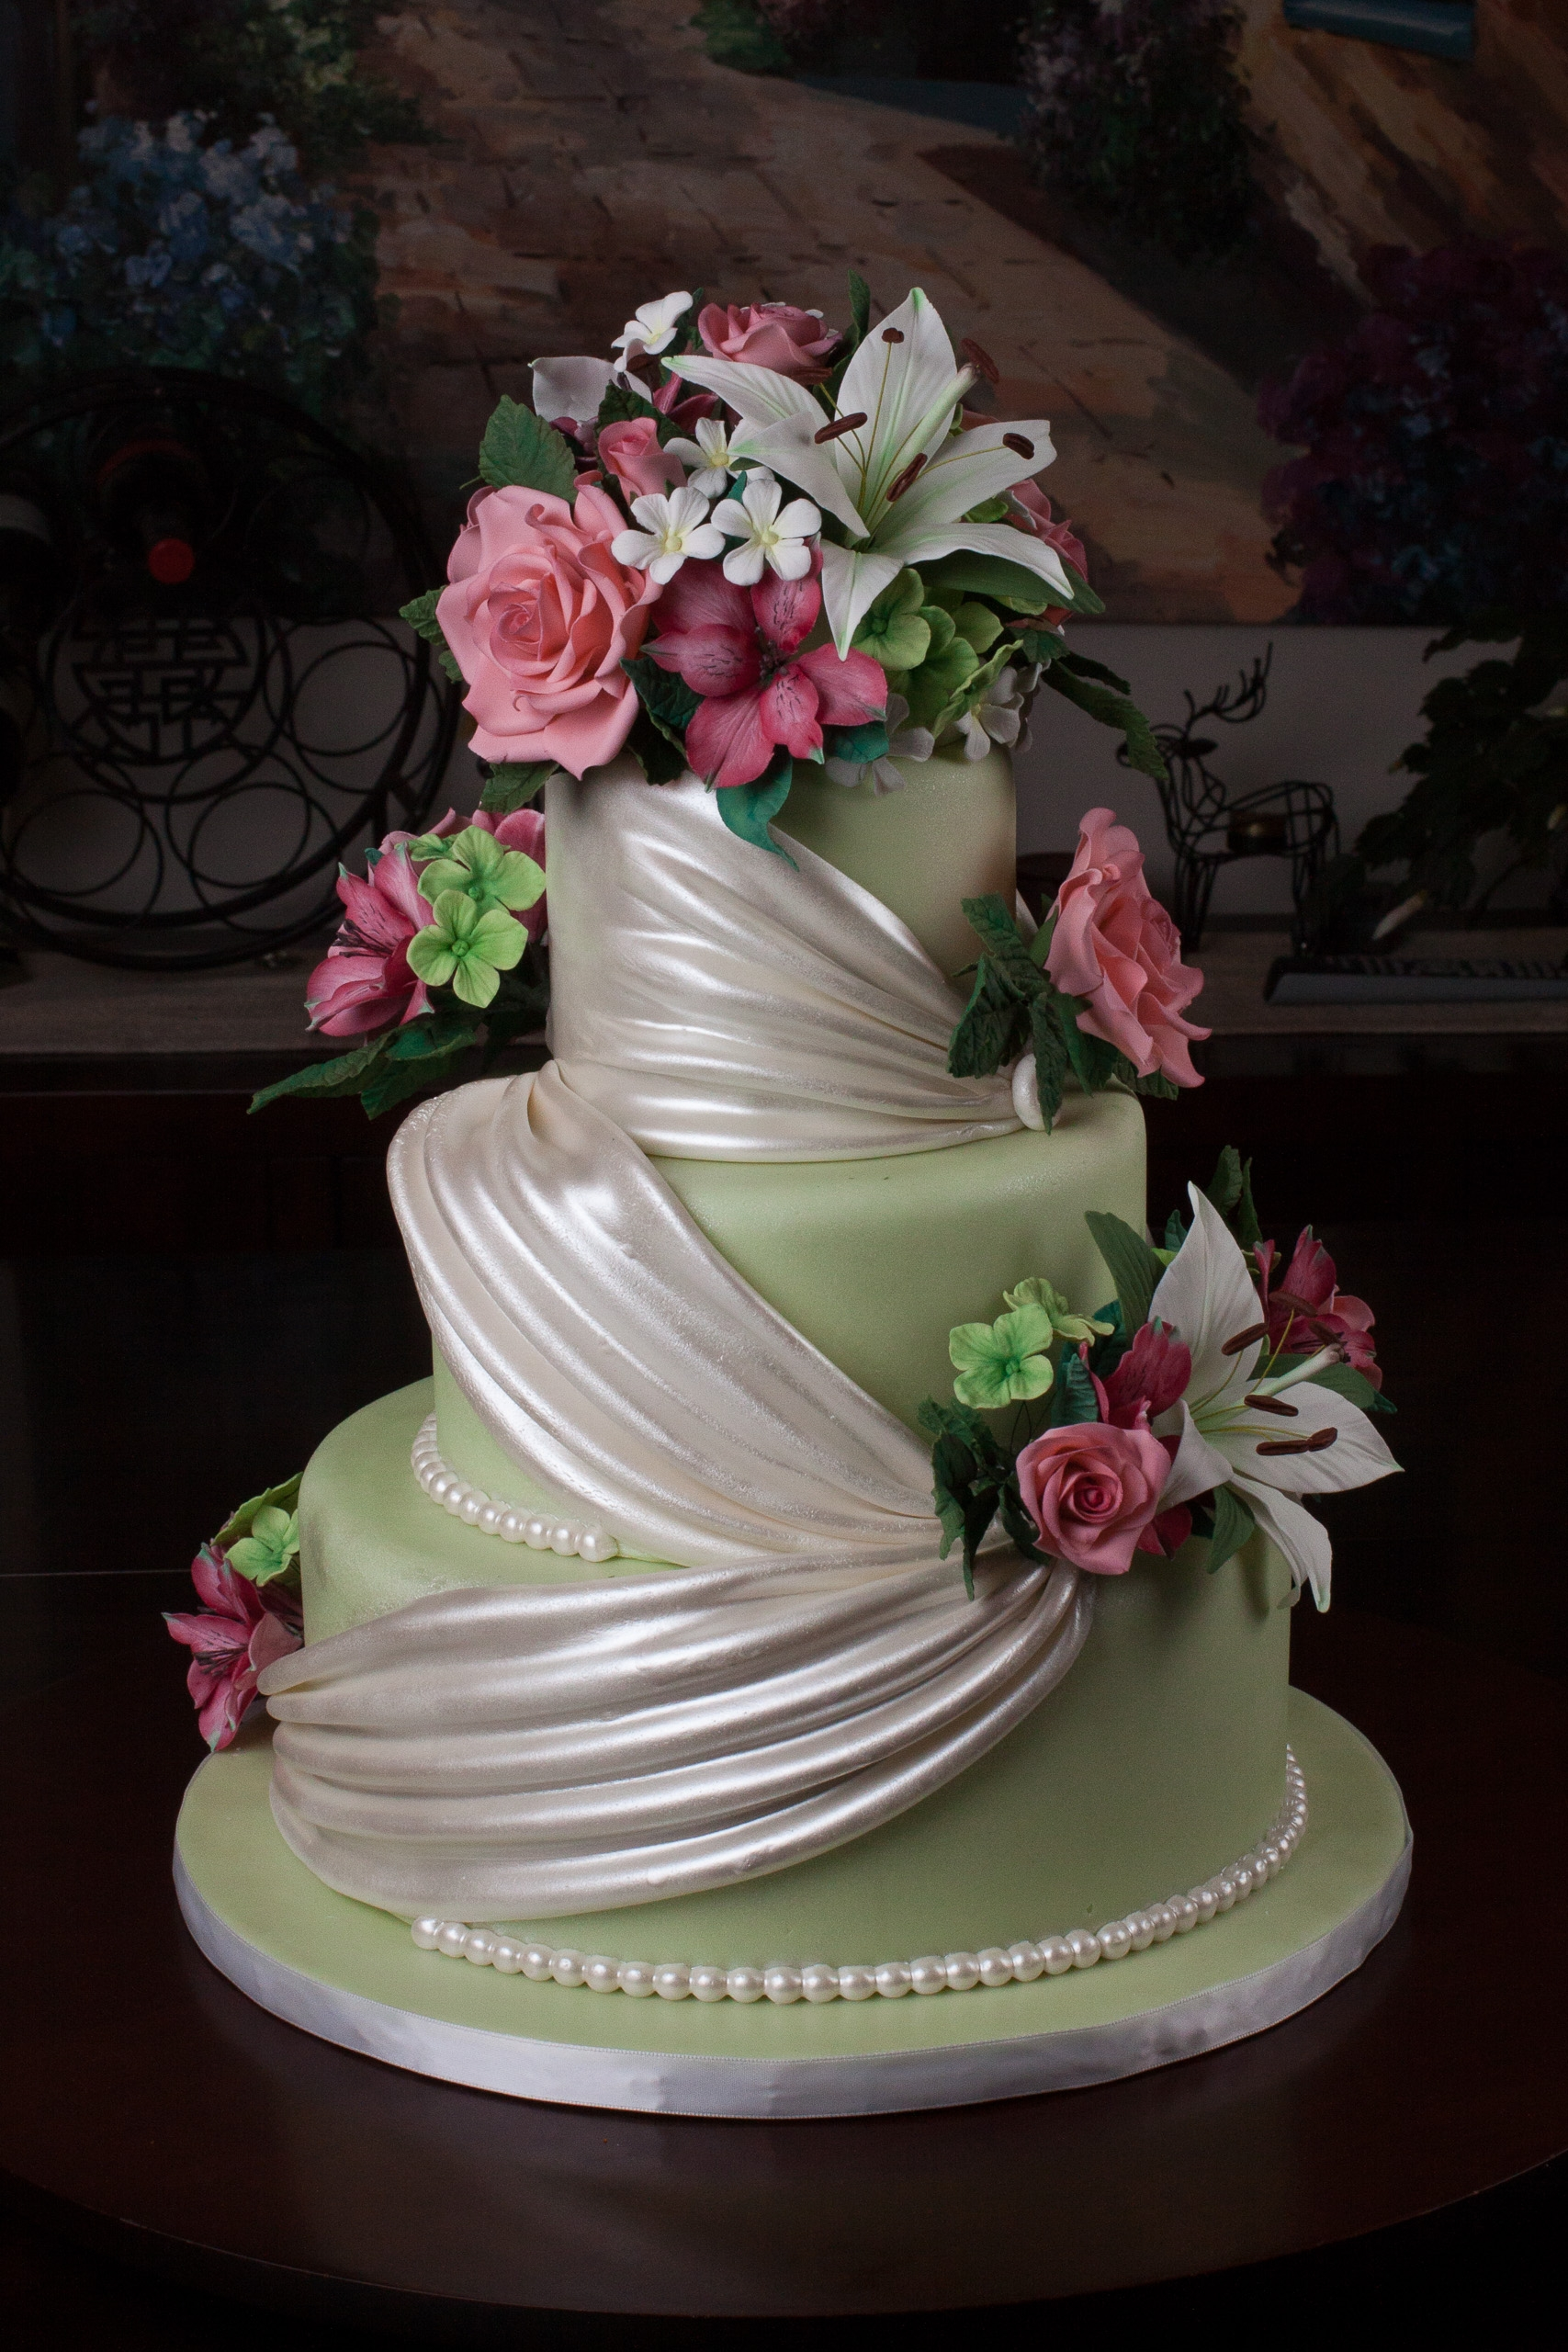 Wedding Cake With Sugar Flowers I Put This Into A Cake